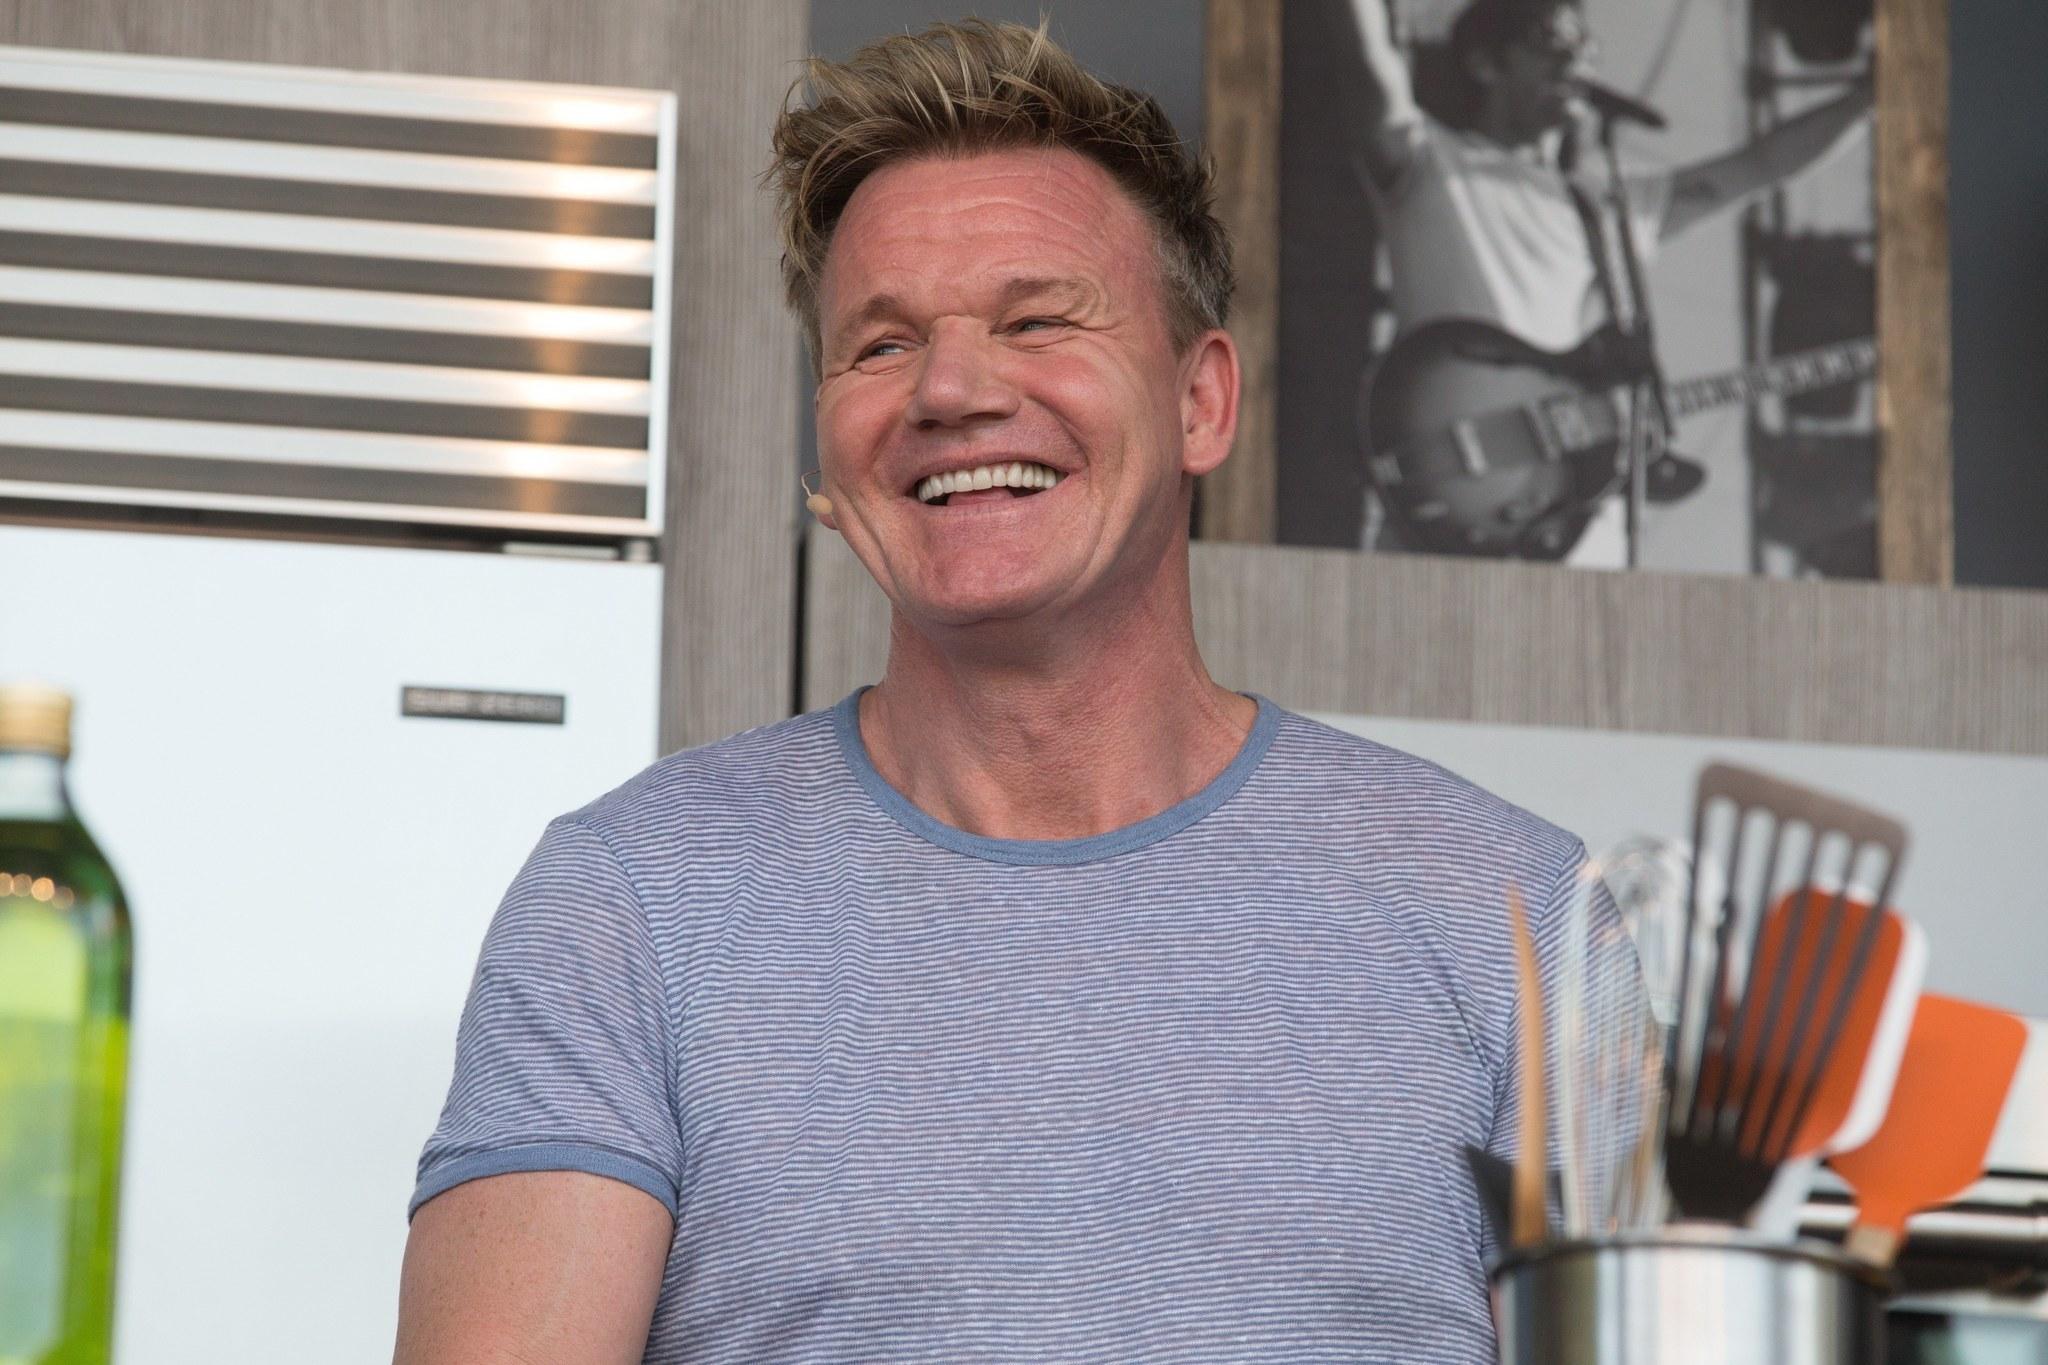 Gordon ramsay surprises 39 hell 39 s kitchen 39 winner christina for Gordon ramsay home kitchen